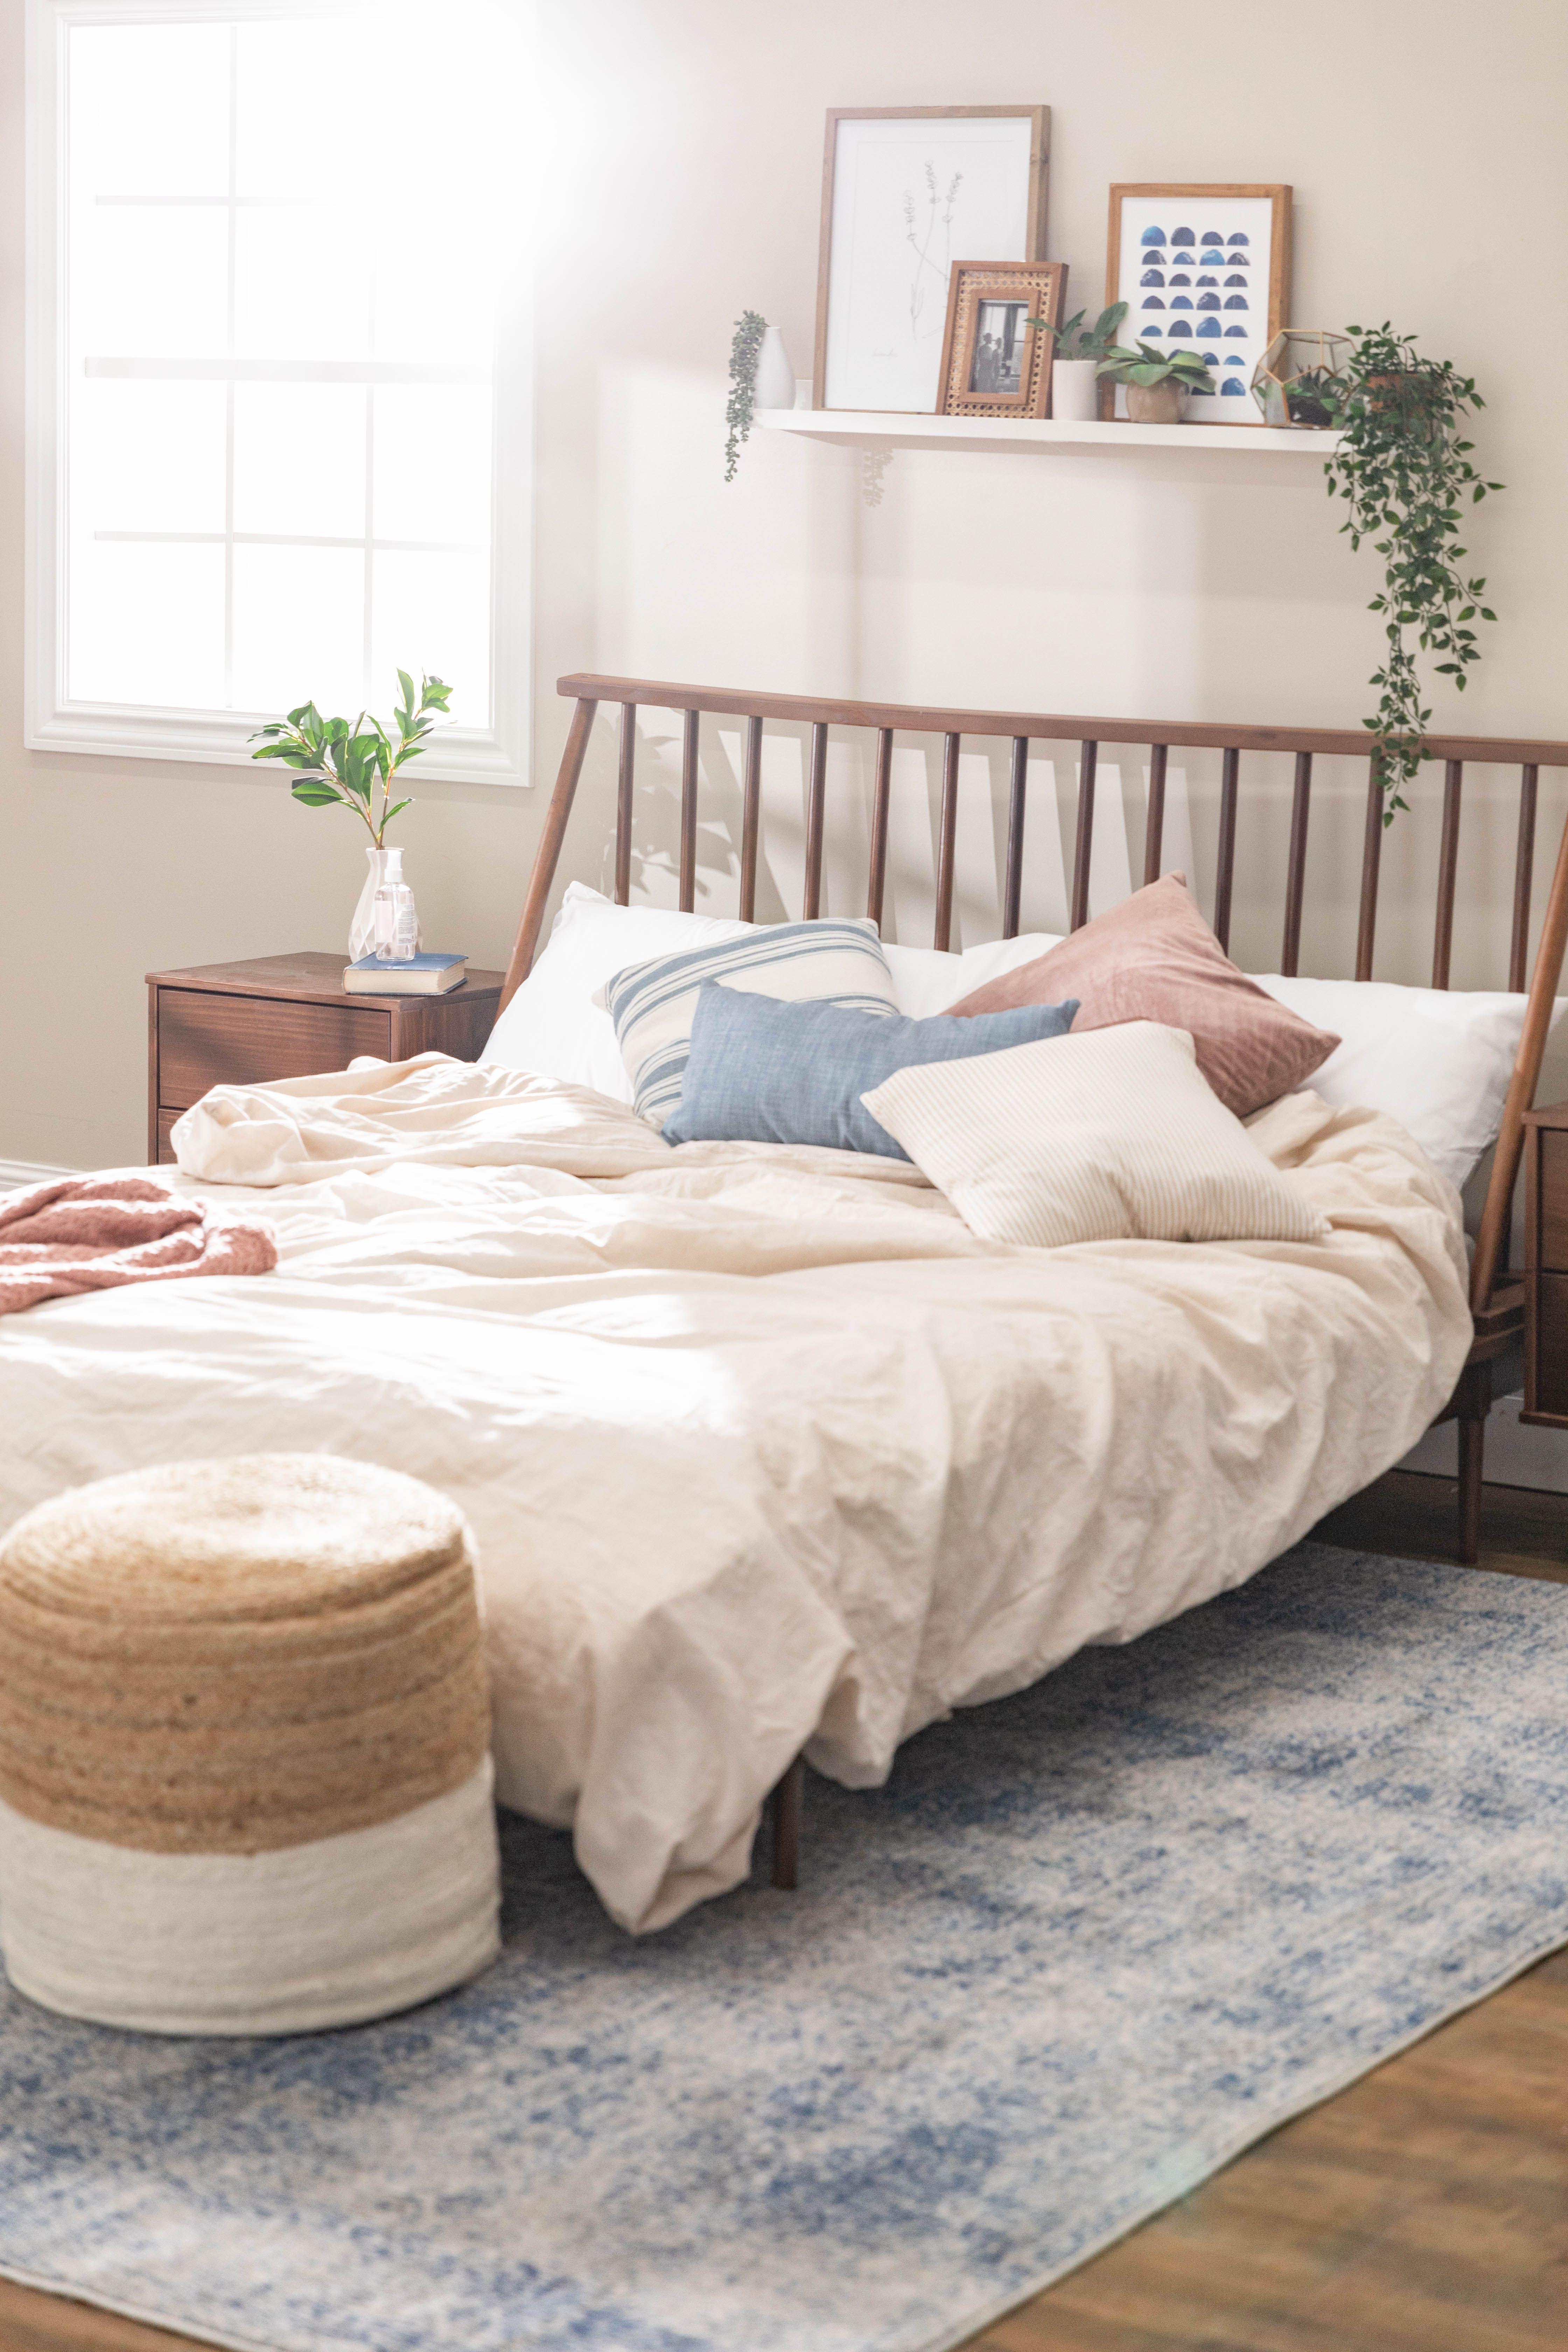 Spindle Back Solid Wood Queen Bed Floating Shelves Bedroom Home